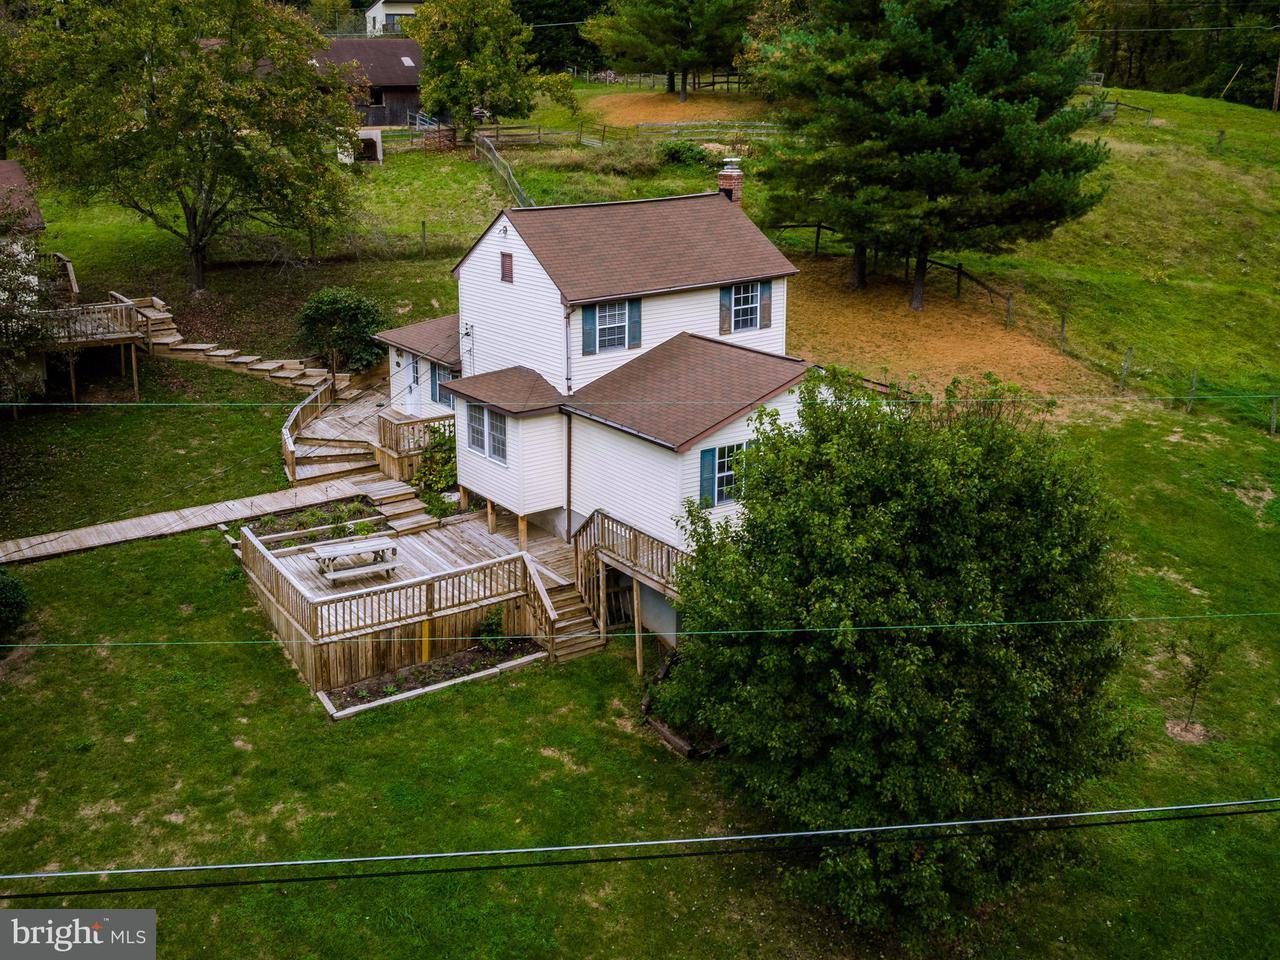 Single Family Home for Sale at 3536 DOBERMAN Drive 3536 DOBERMAN Drive New Windsor, Maryland 21776 United States